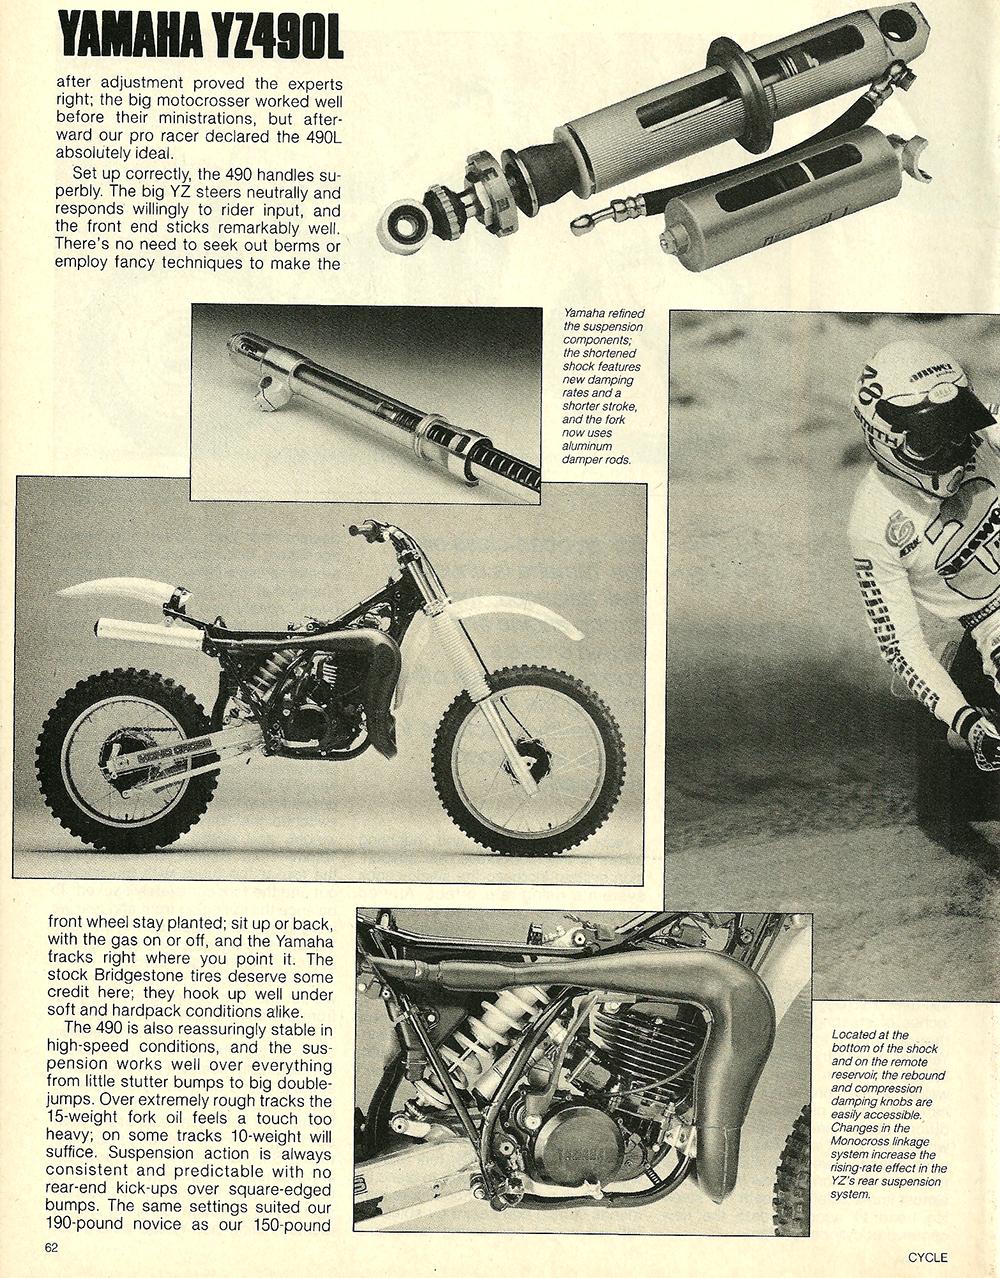 1984 Yamaha YZ490L off road test 5.jpg